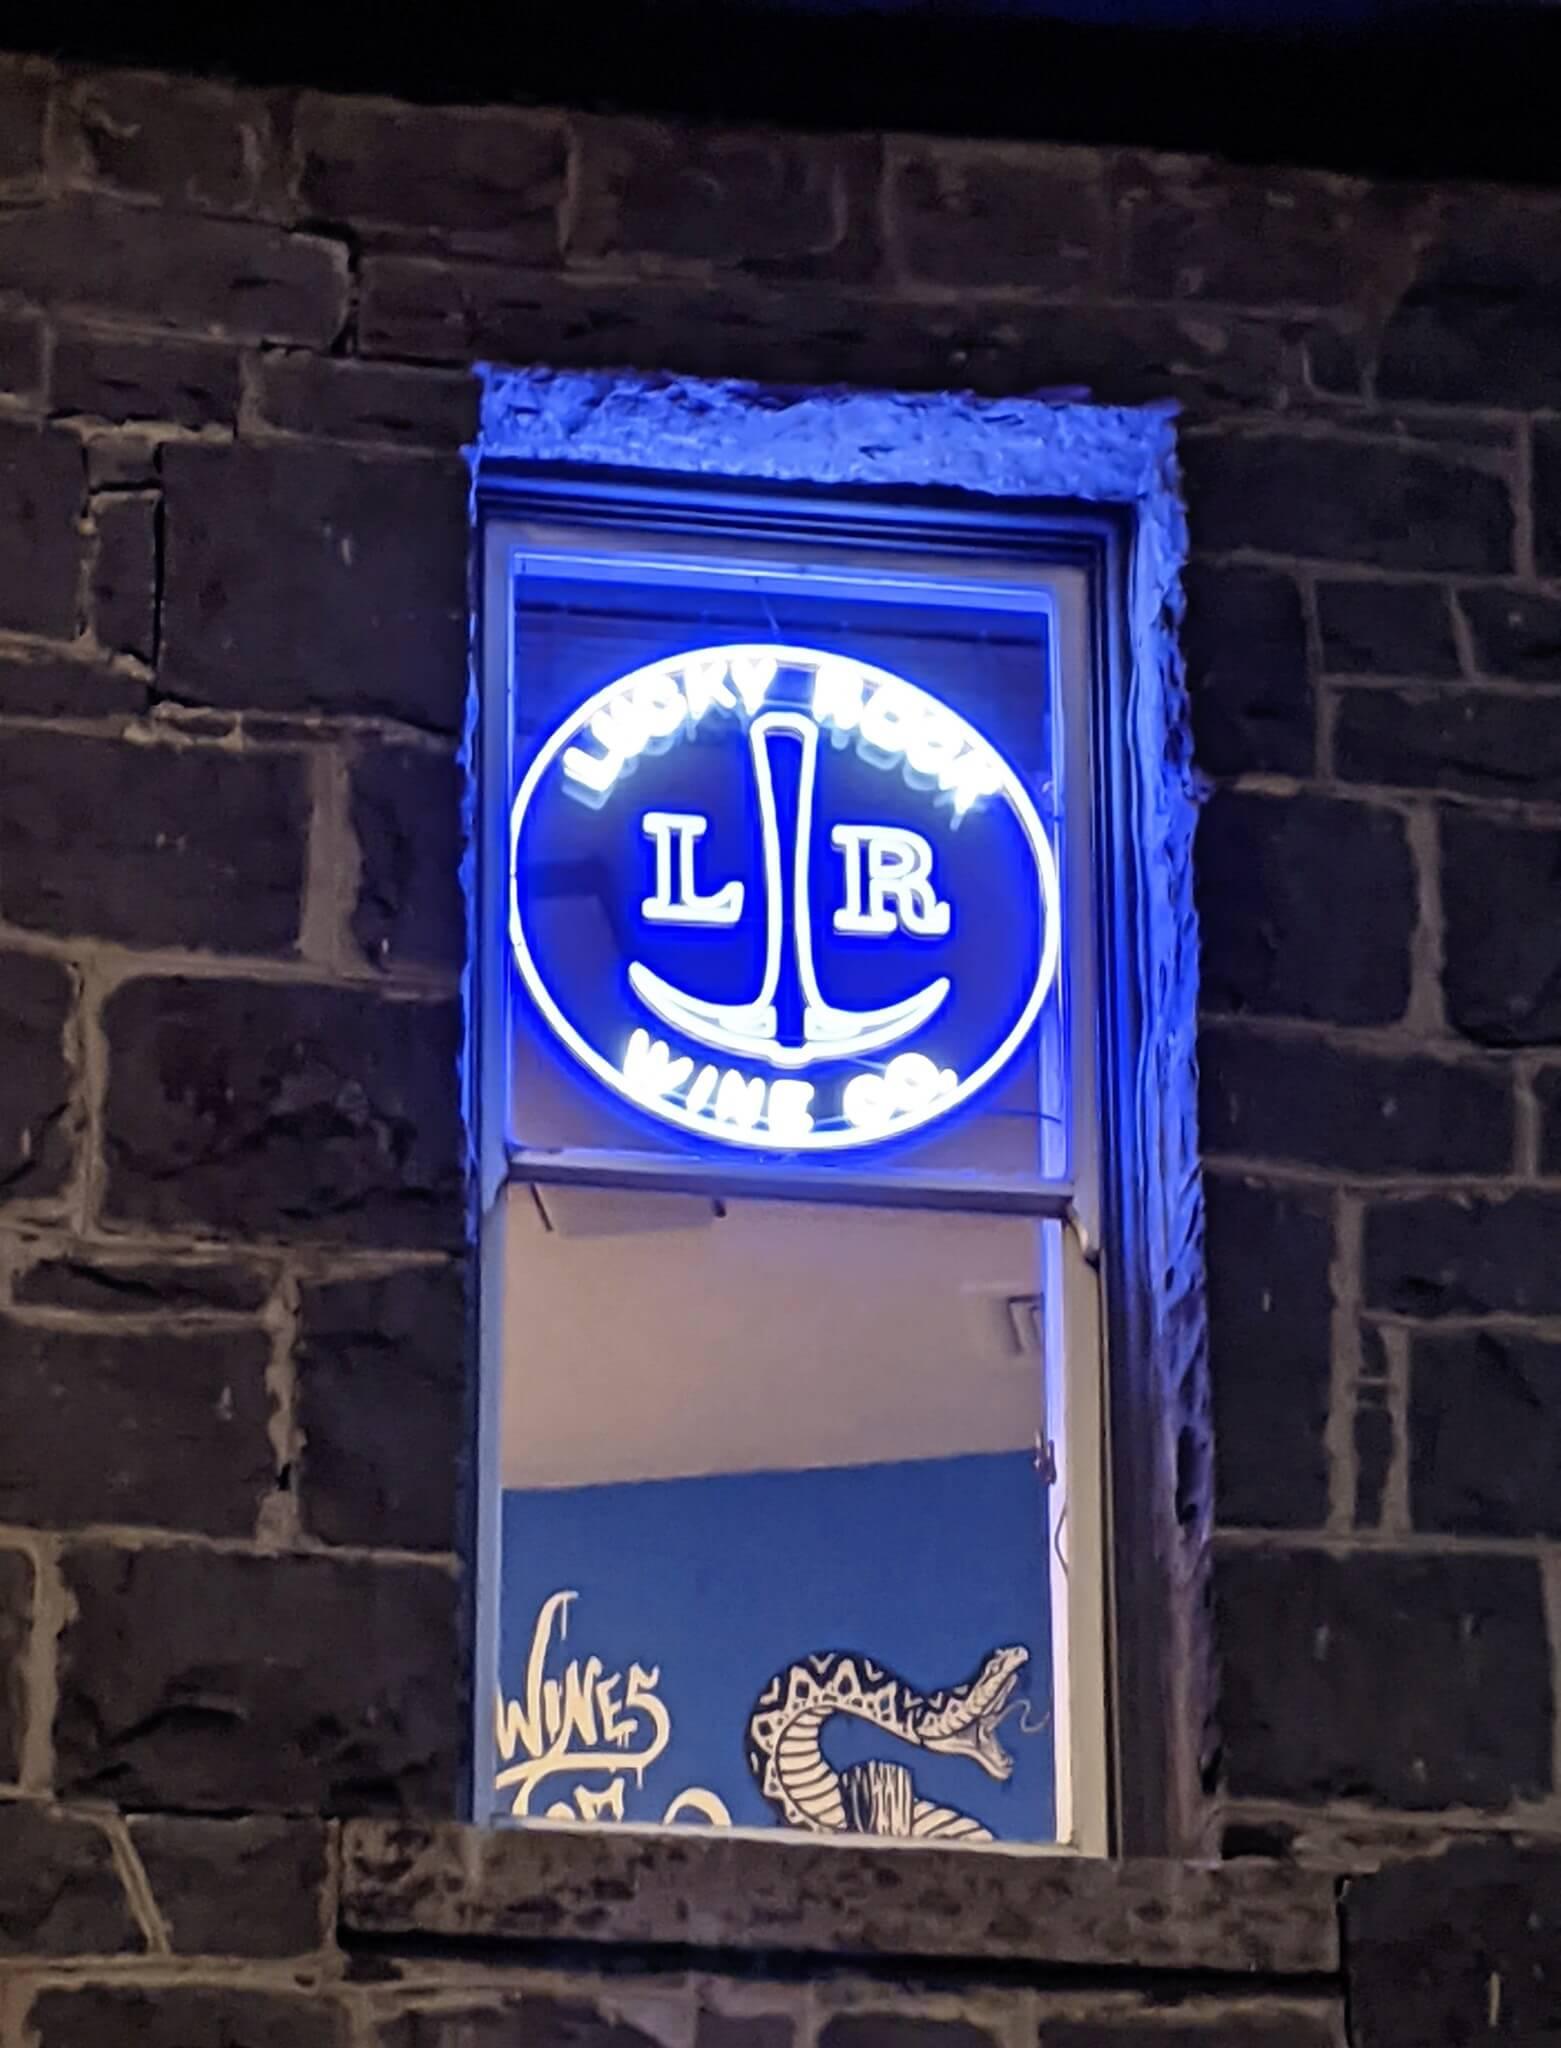 Creative Neon Sign in window